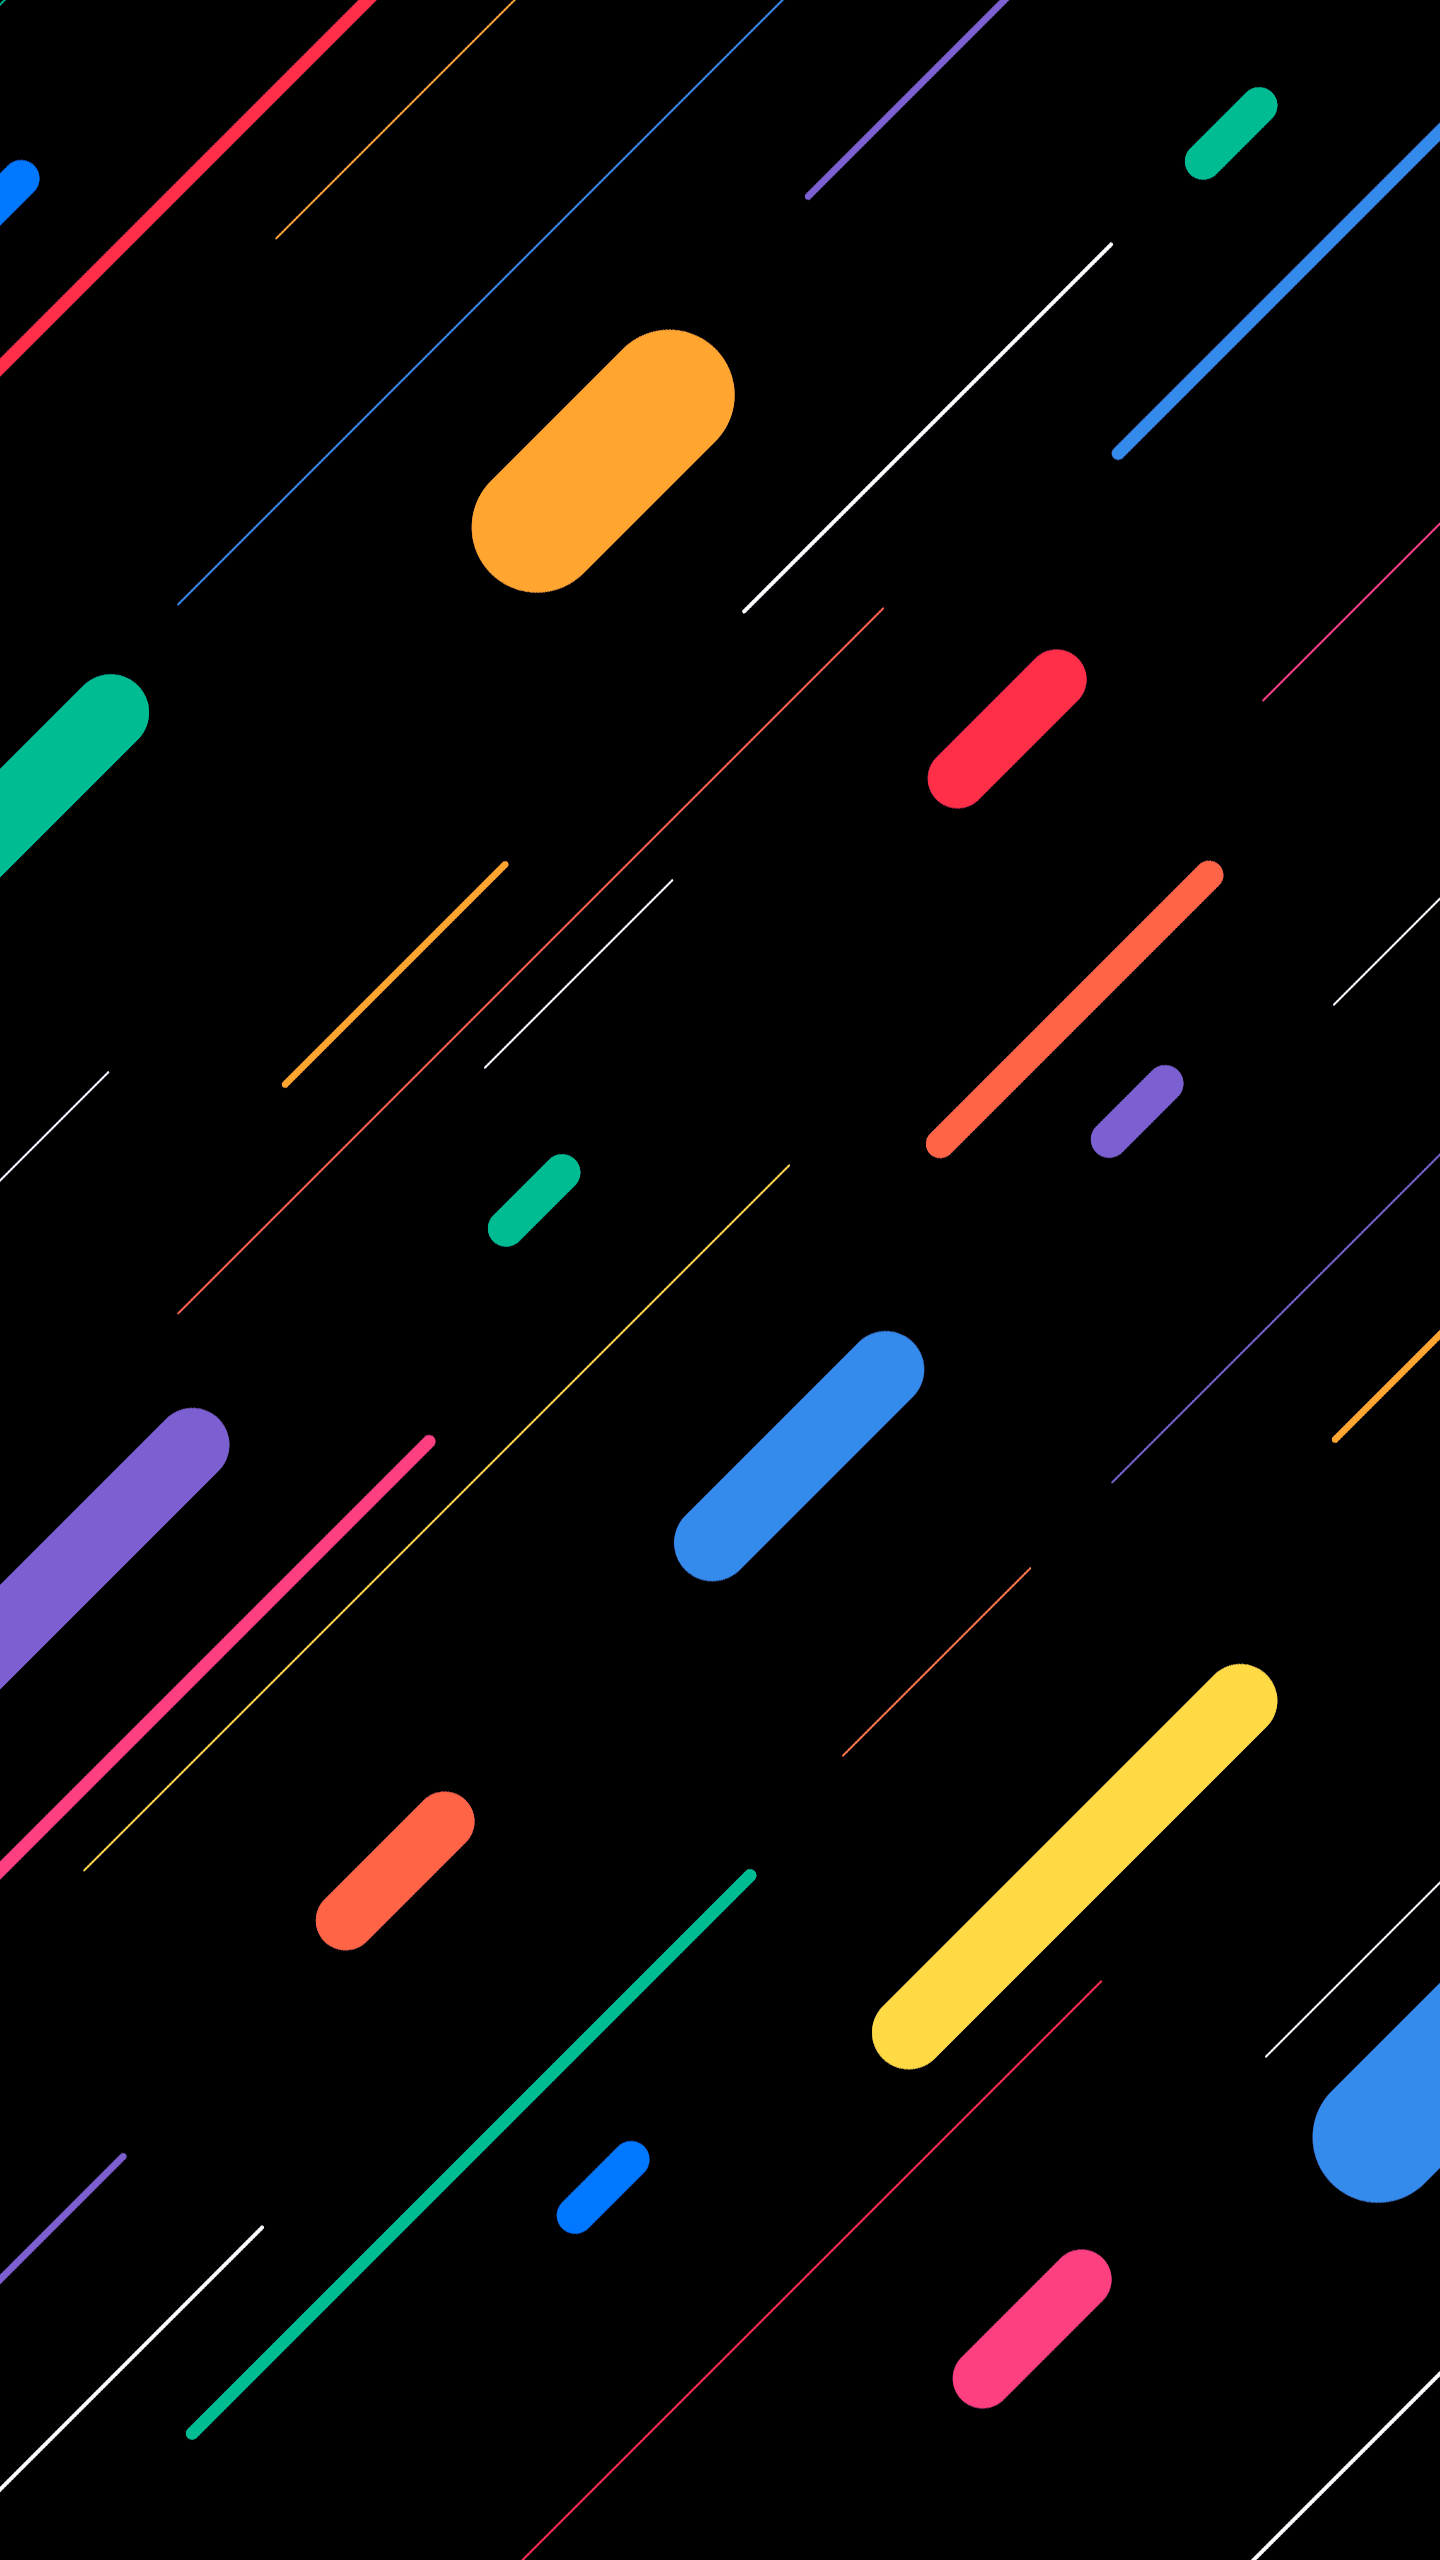 4000 Wallpaper Iphone X Bulan HD Terbaru